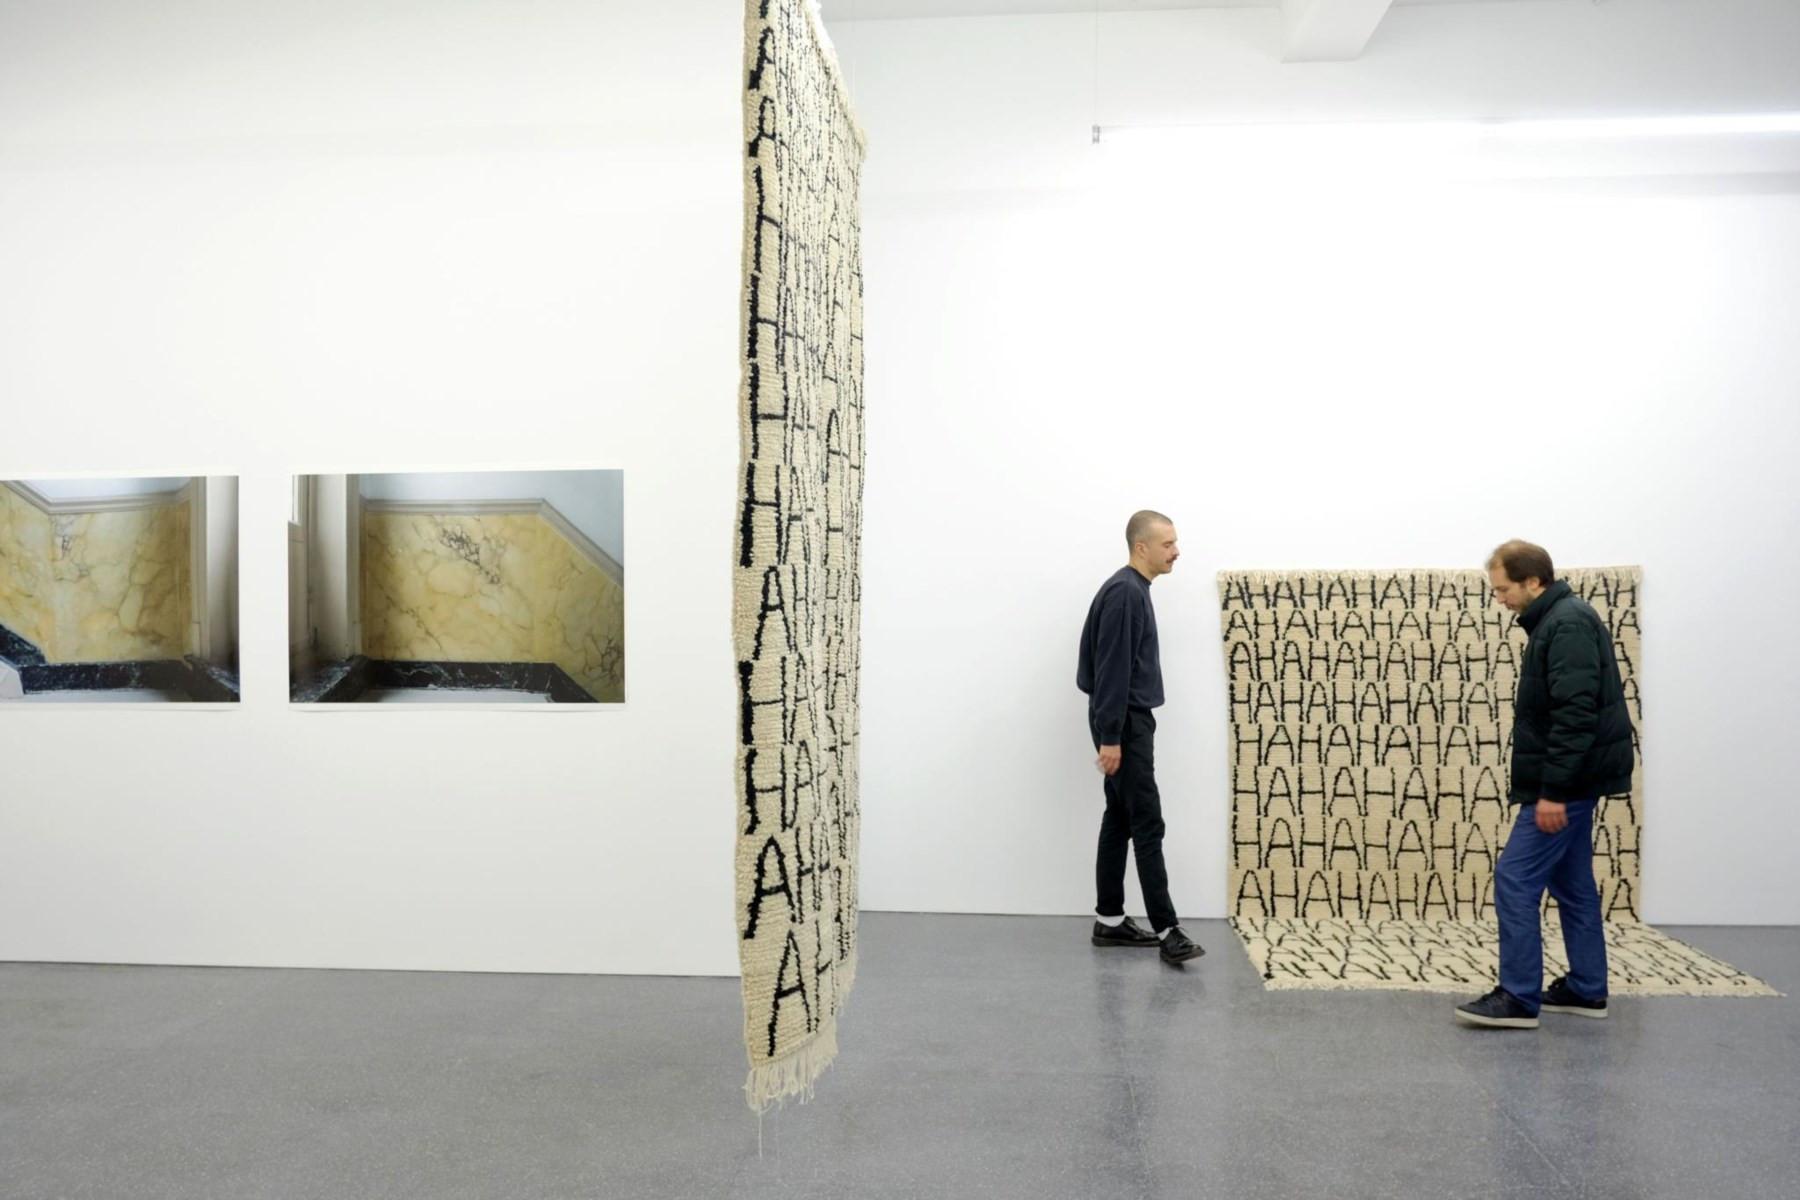 galeria Lehmann 1178506.jpg